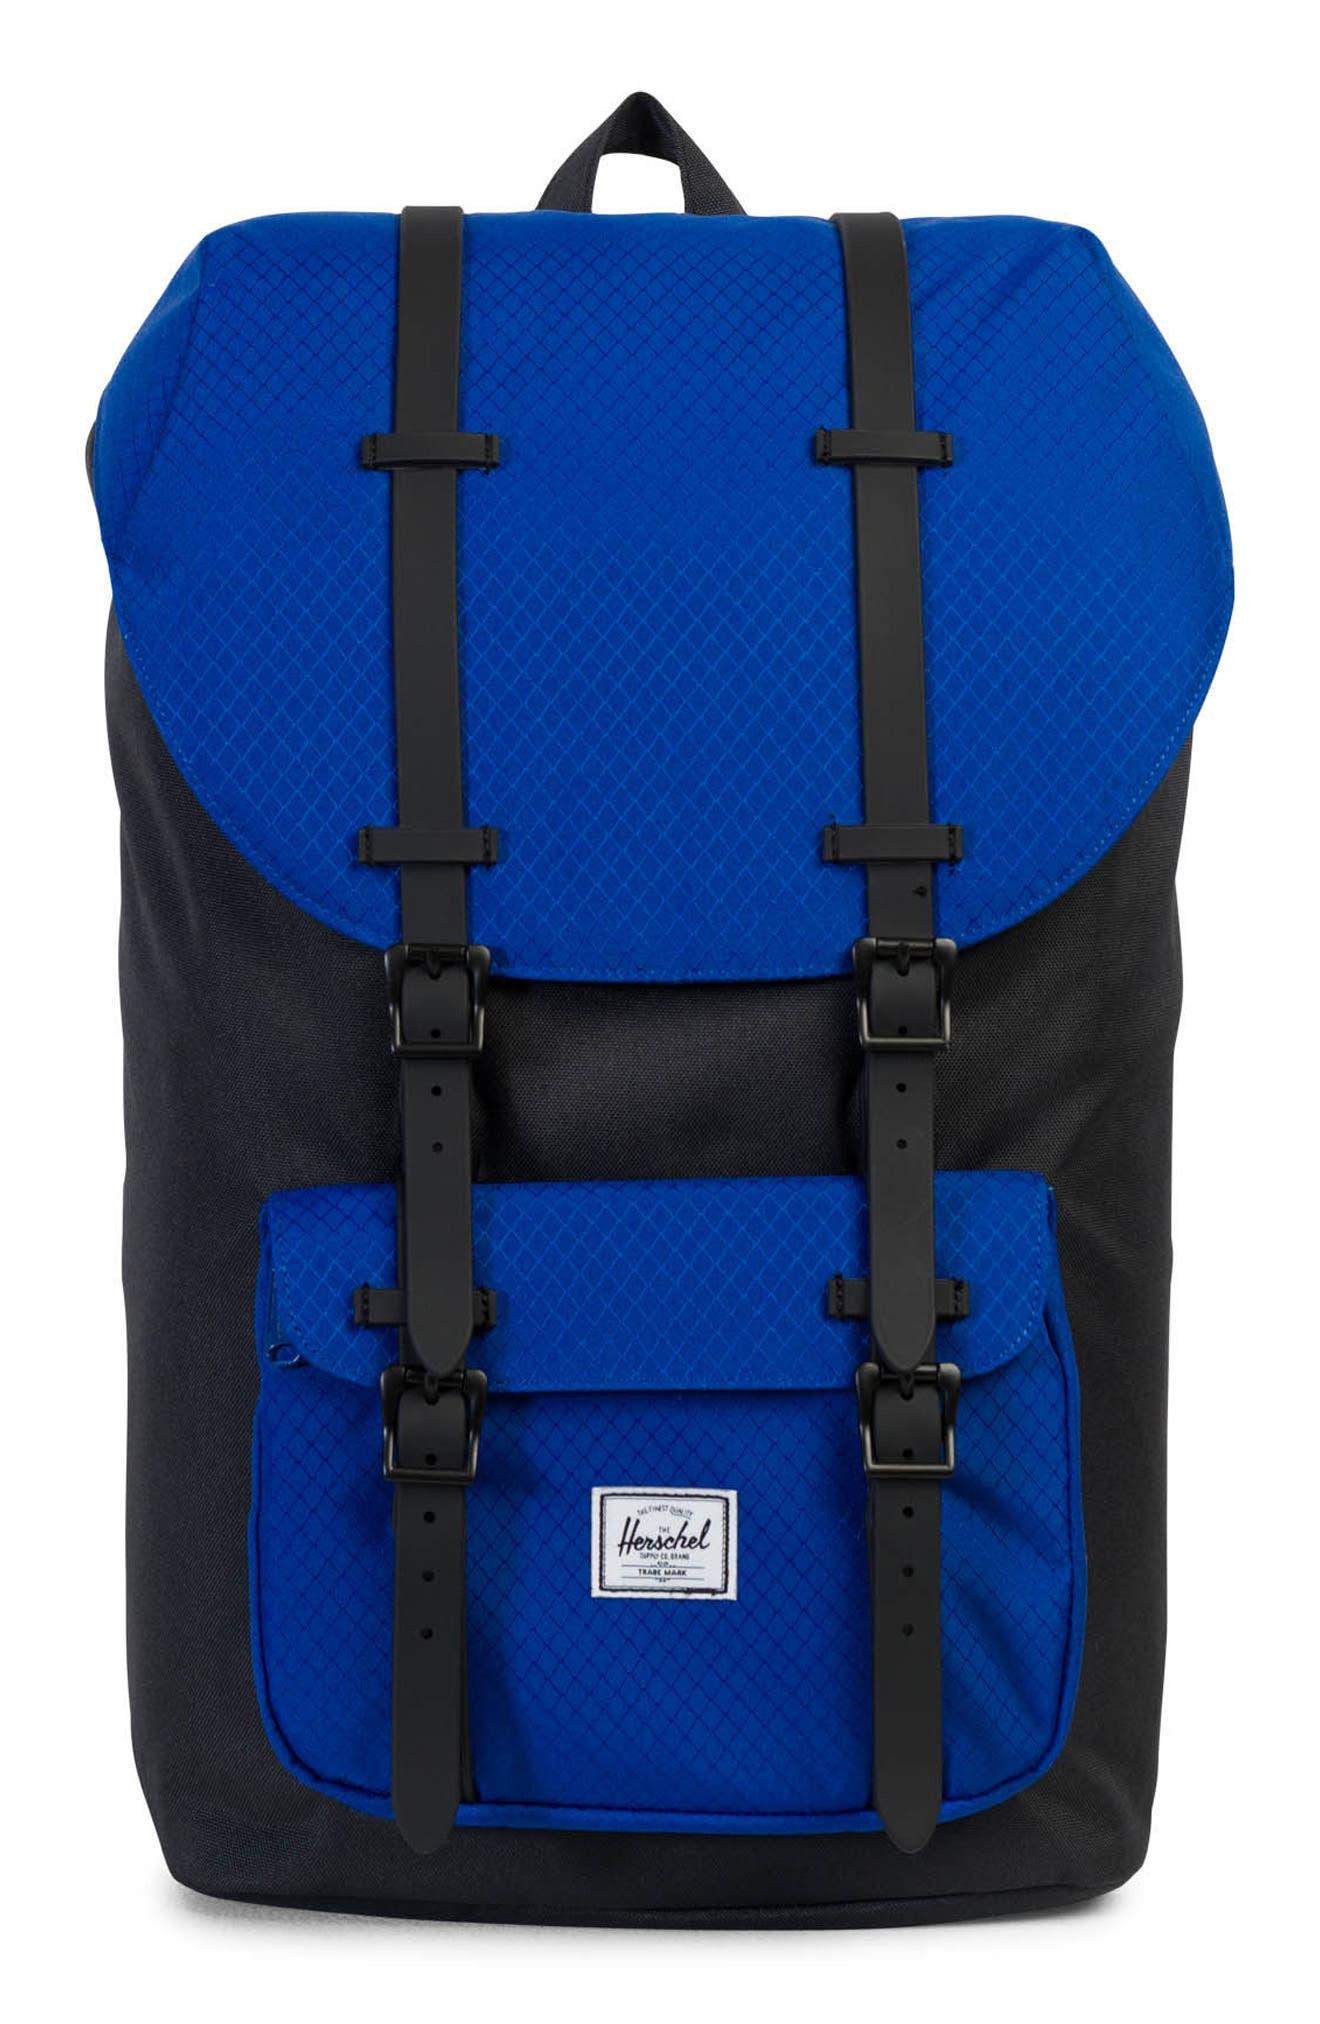 Main Image - Herschel Supply Co. Little America Contrast Backpack